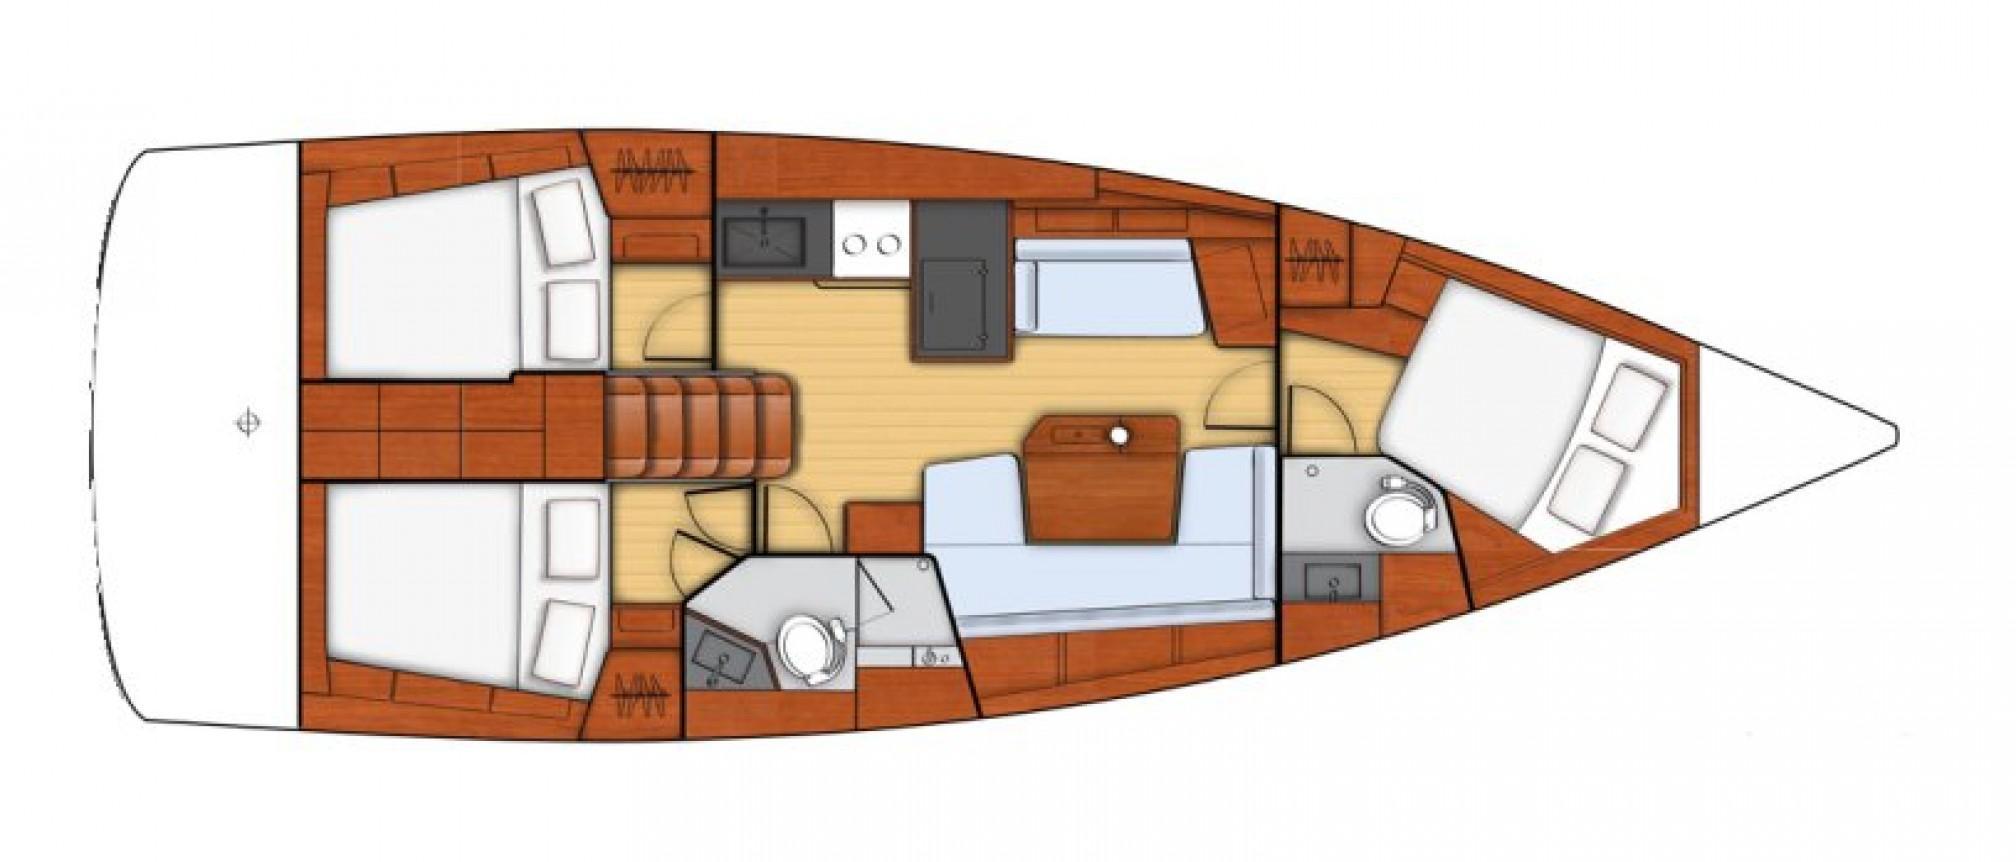 Beneteau Oceanis 41.1 layout